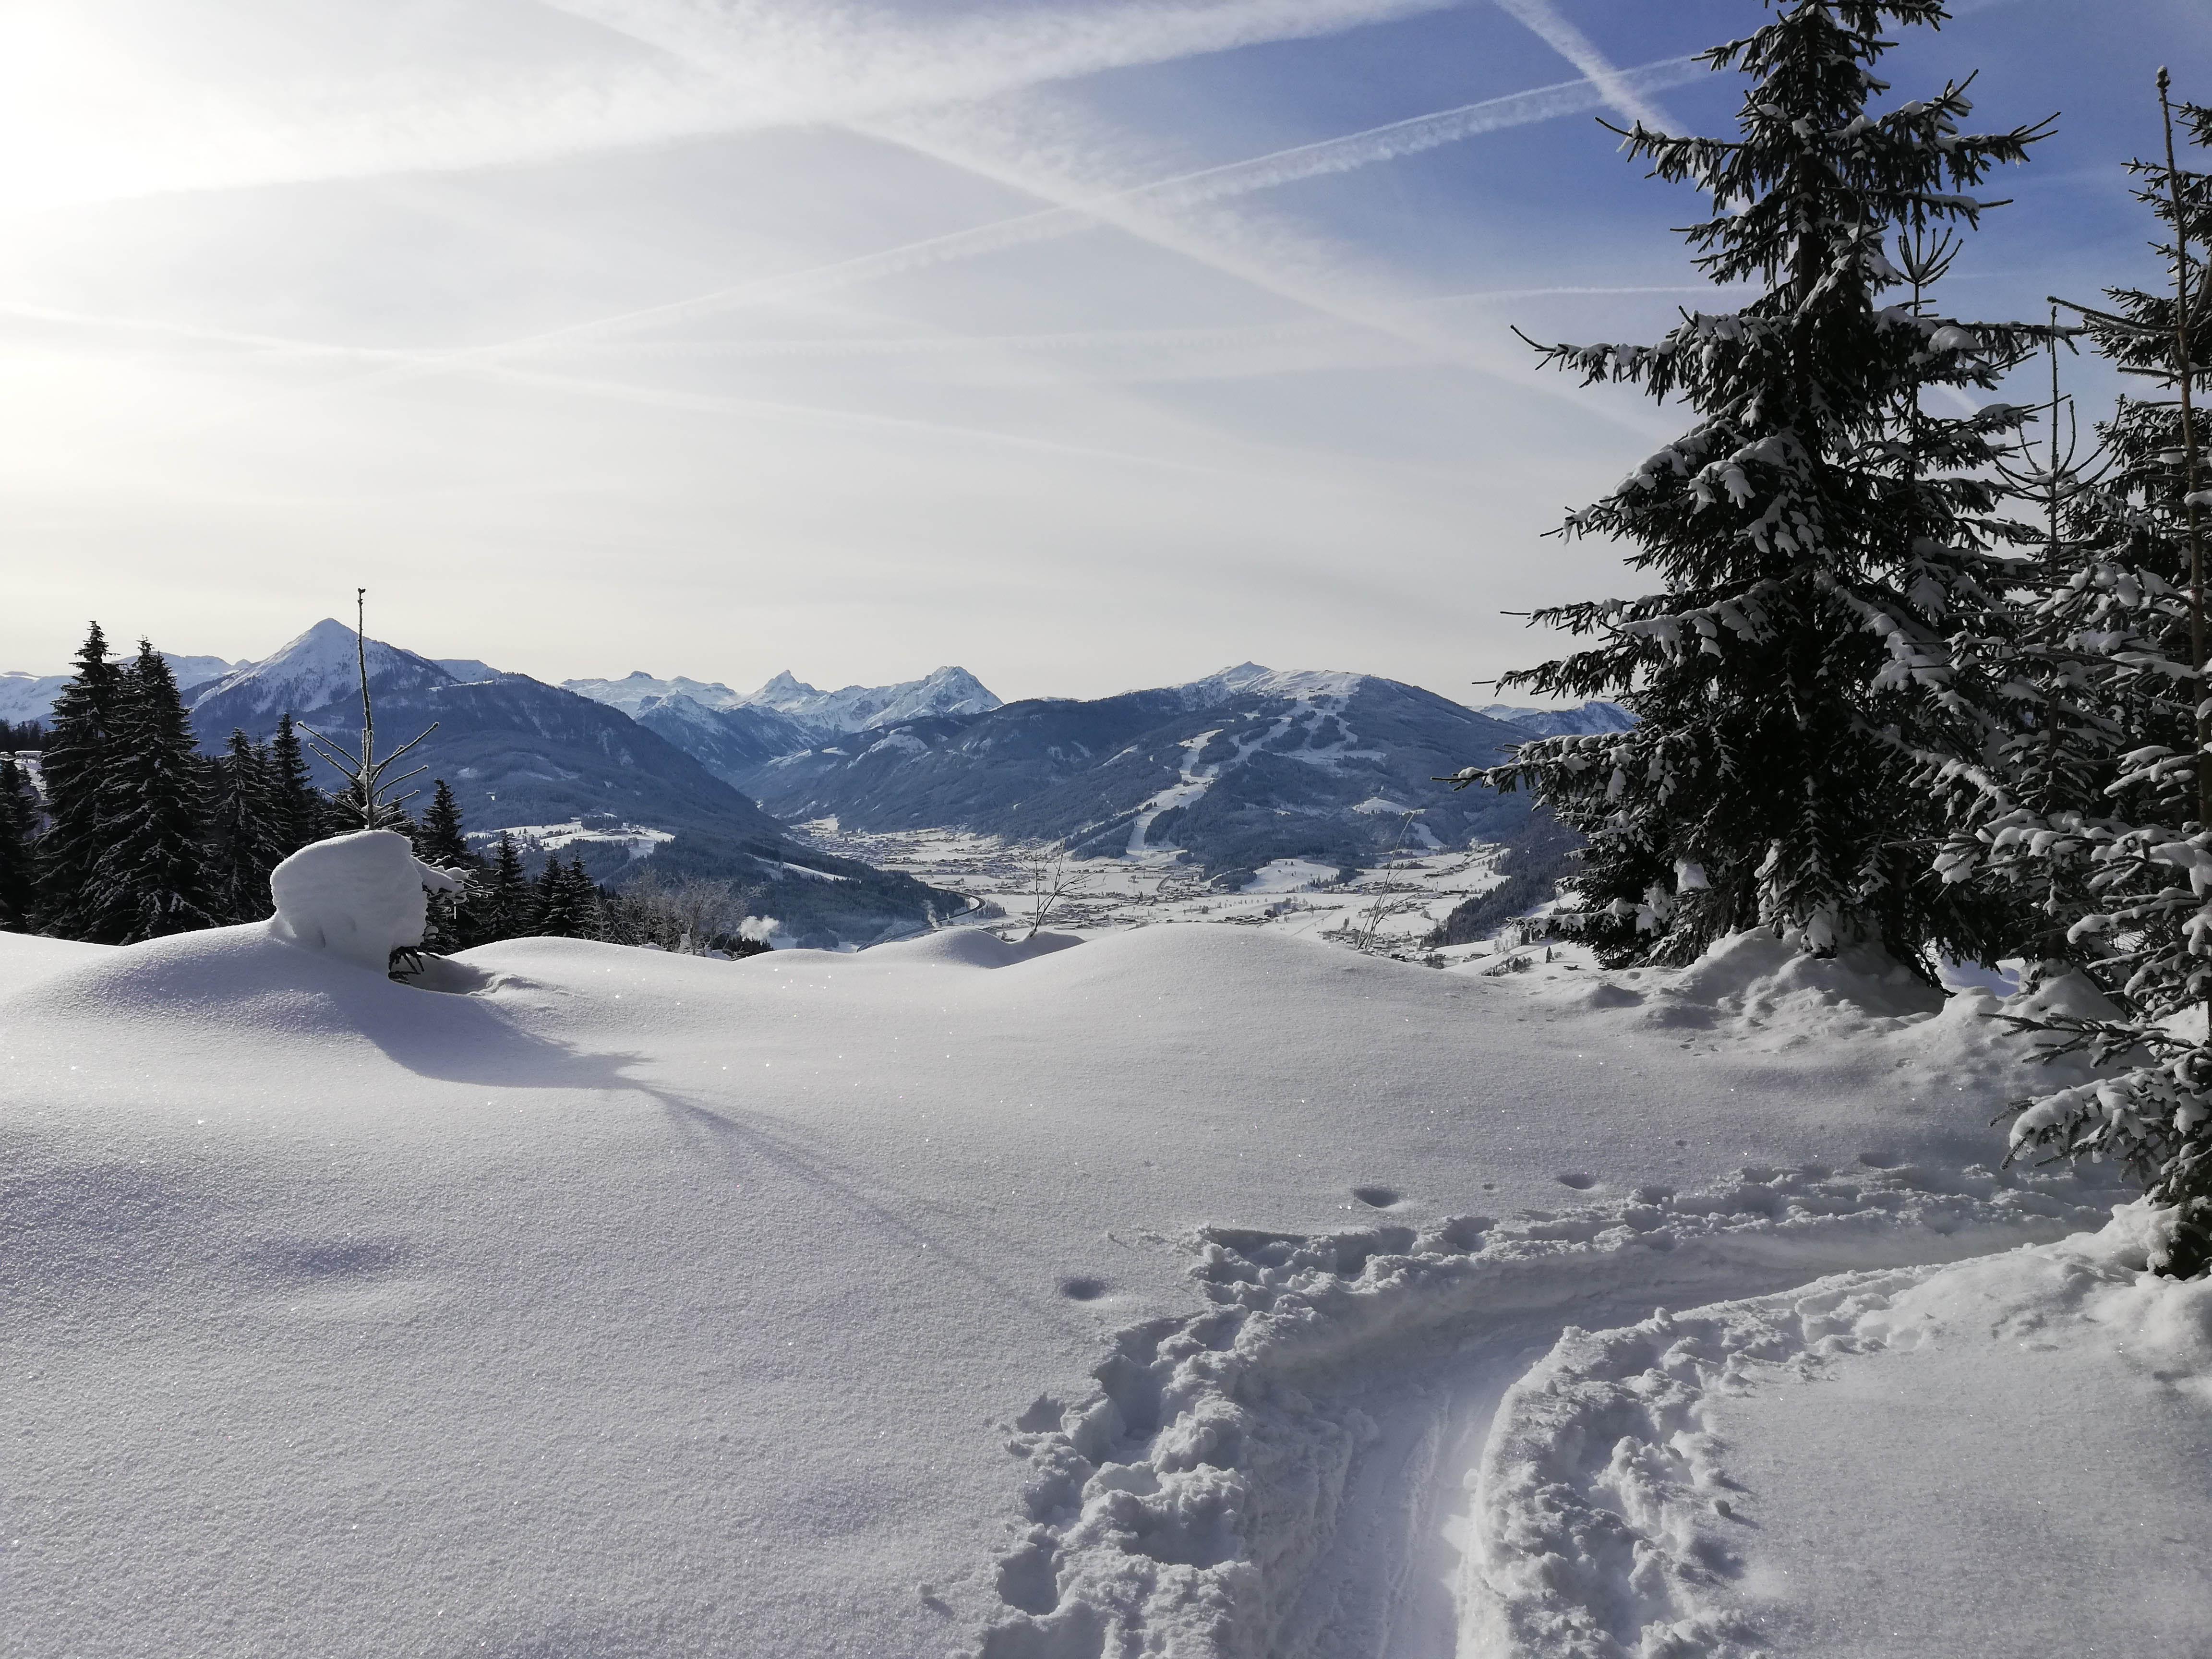 Ski Touren Tips in Salzburg